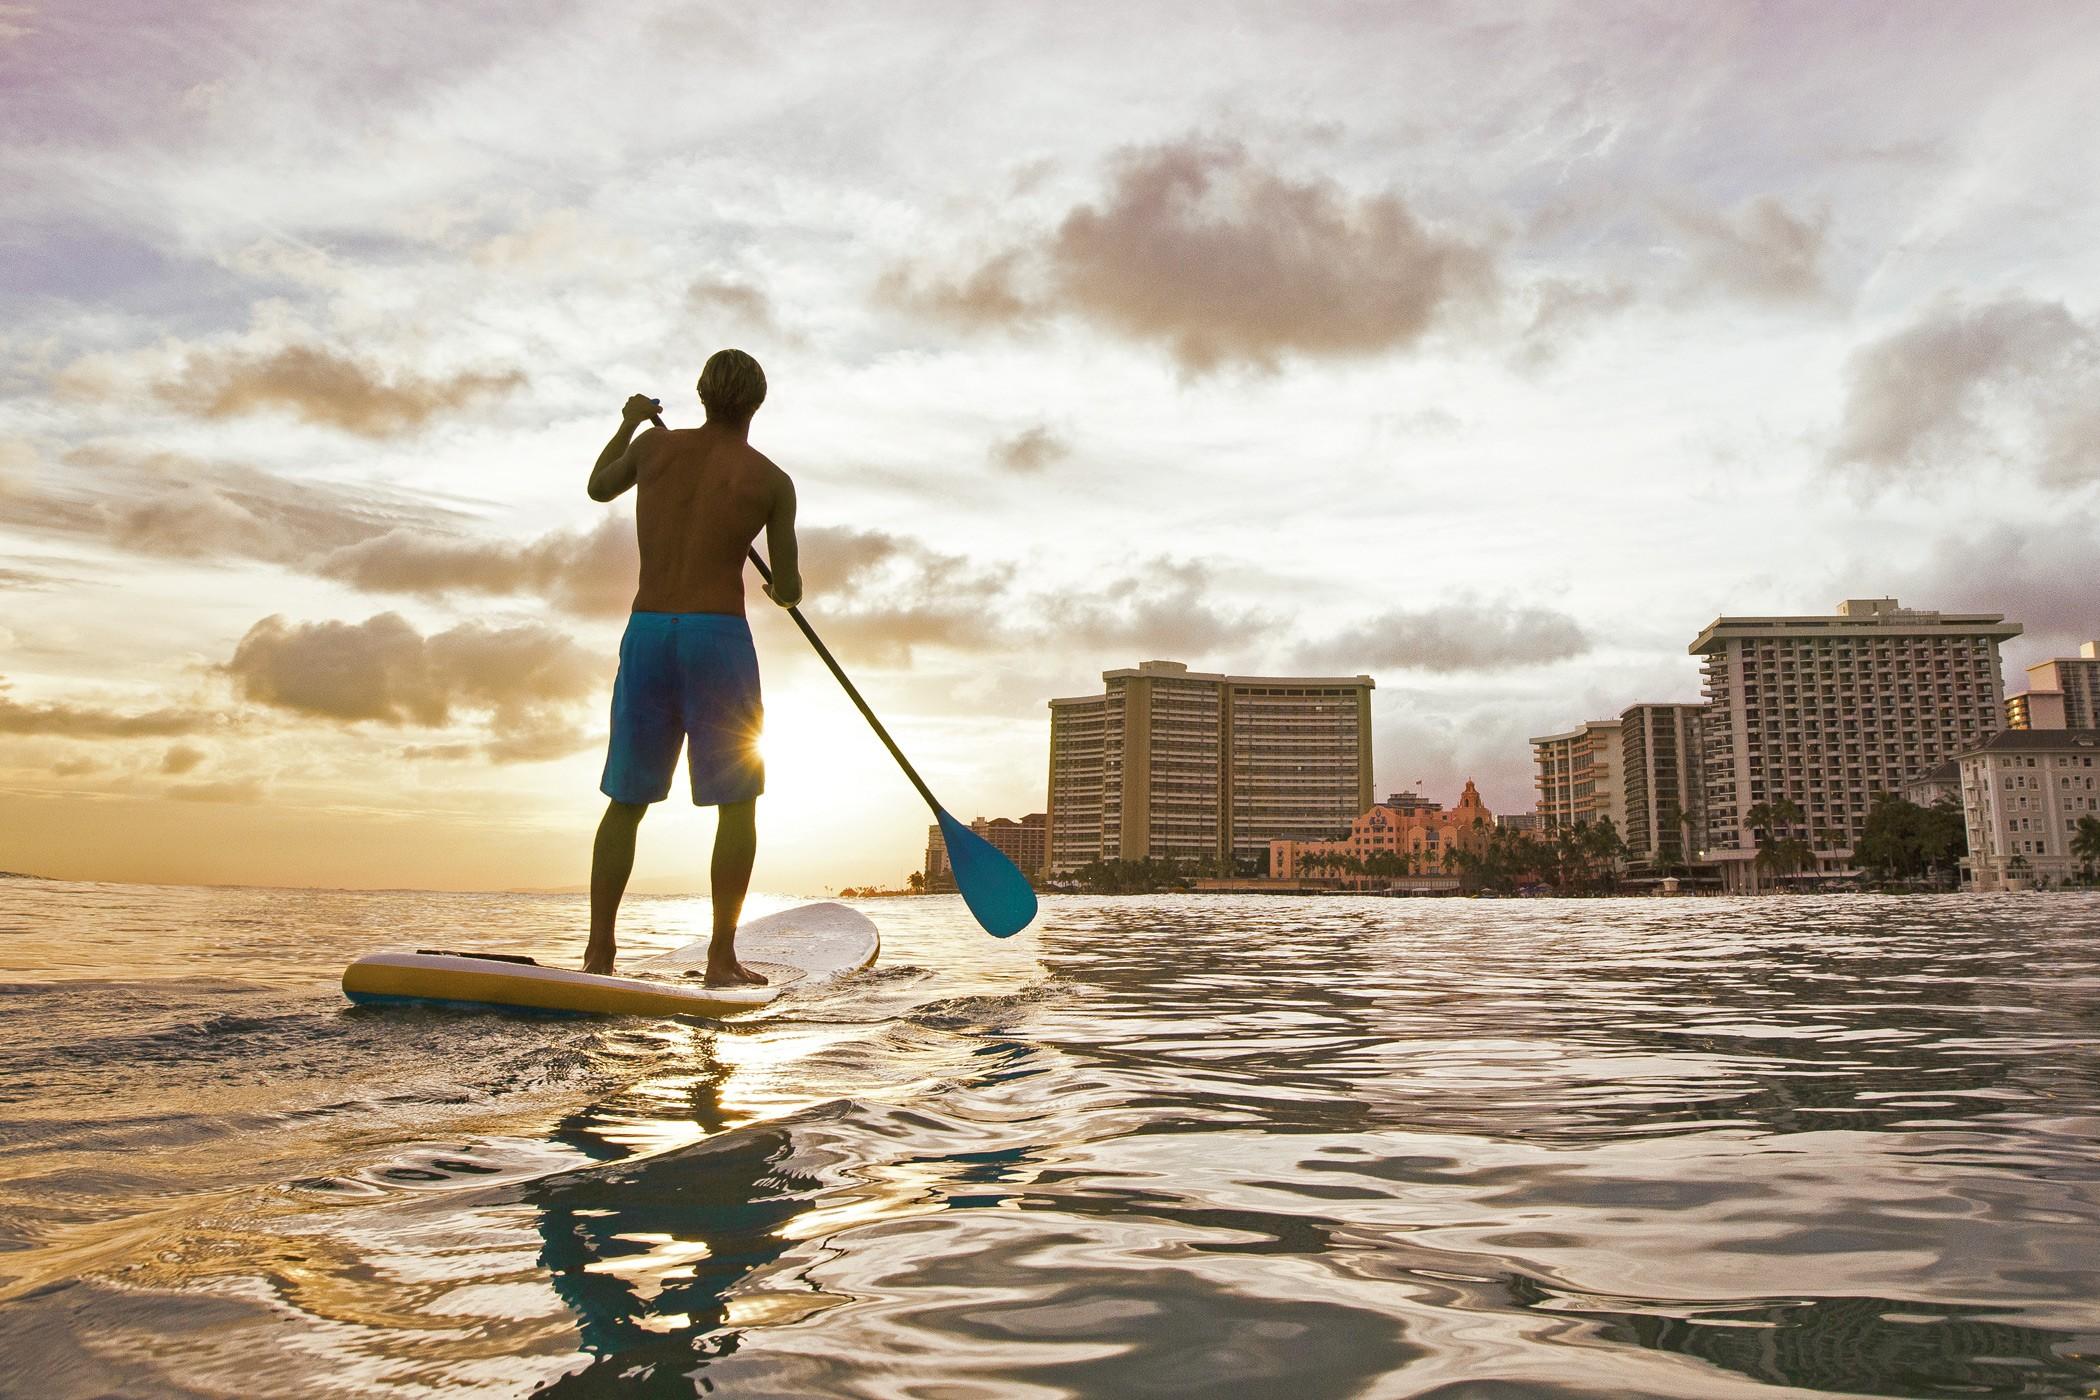 royal-hawaiian-luxury-collection-resort-honolulu-surfer